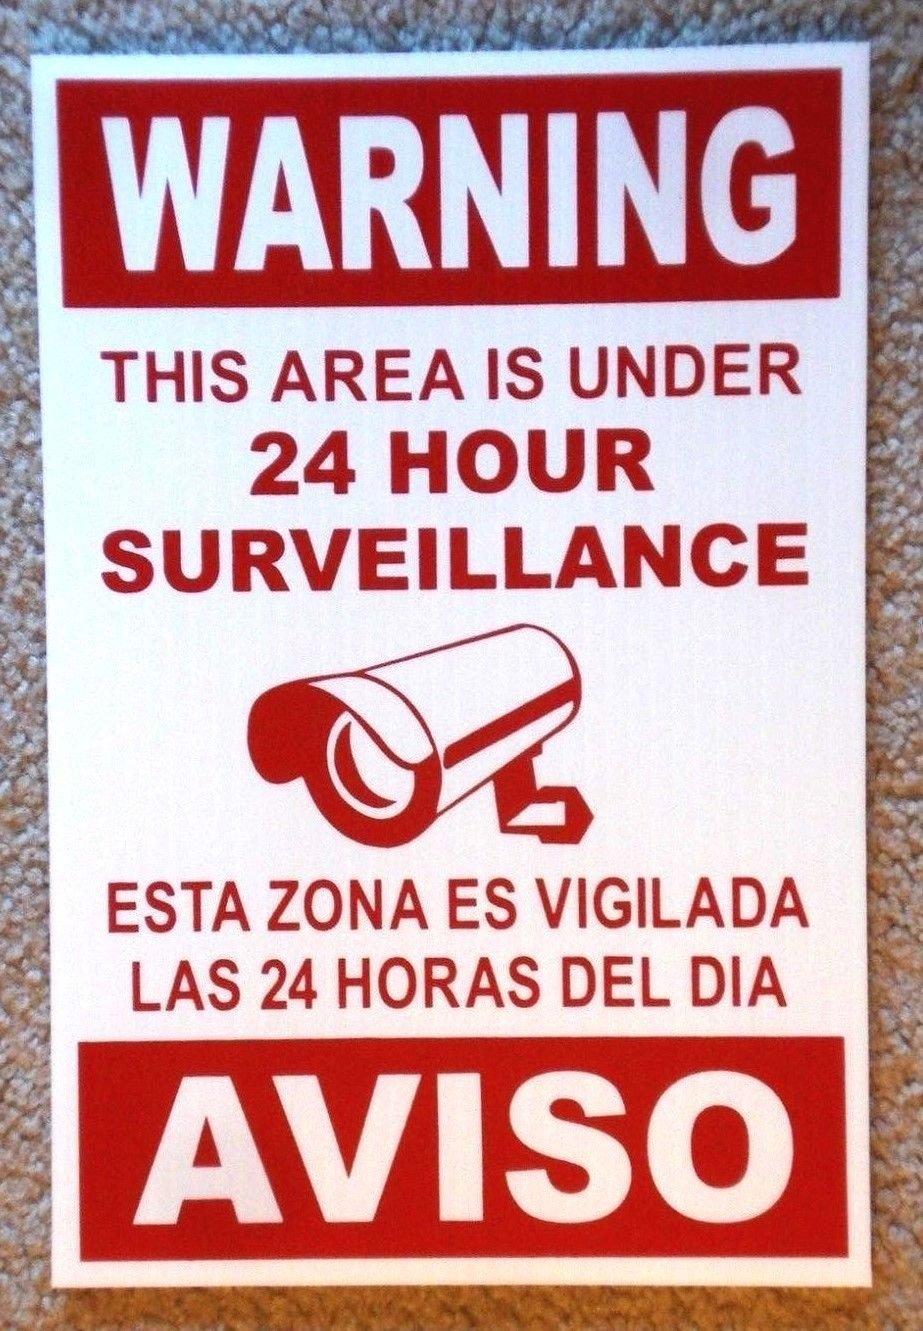 Security Video Surveillance Warning  24 Hr  Sign 12x18 Spanish English